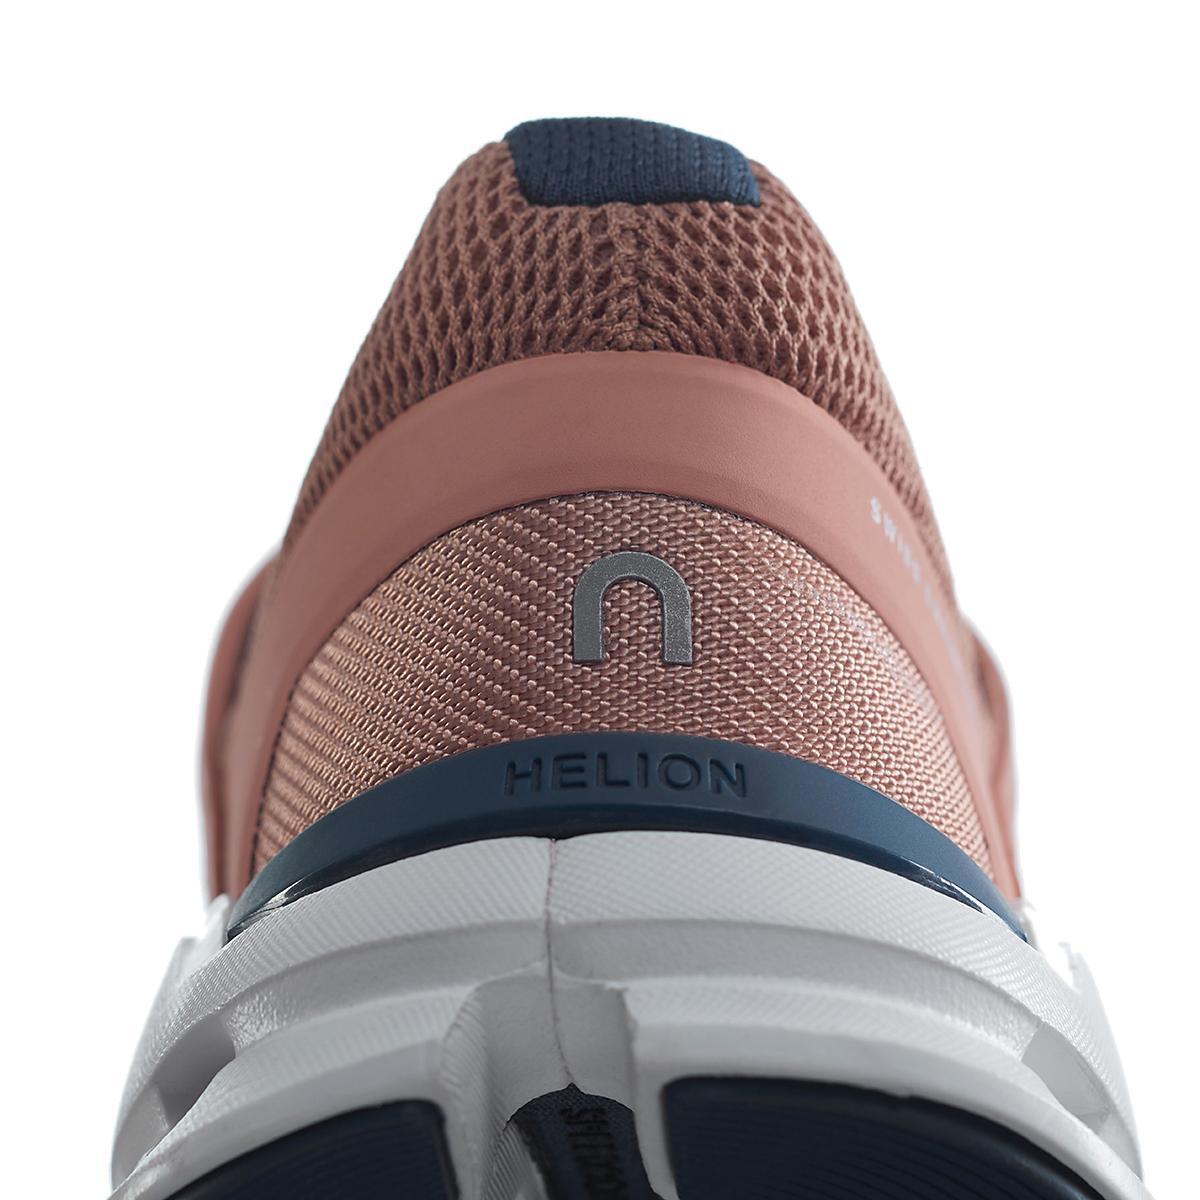 Women's On Cloudswift Running Shoe - Color: Blush/Denim - Size: 6 - Width: Regular, Blush/Denim, large, image 3